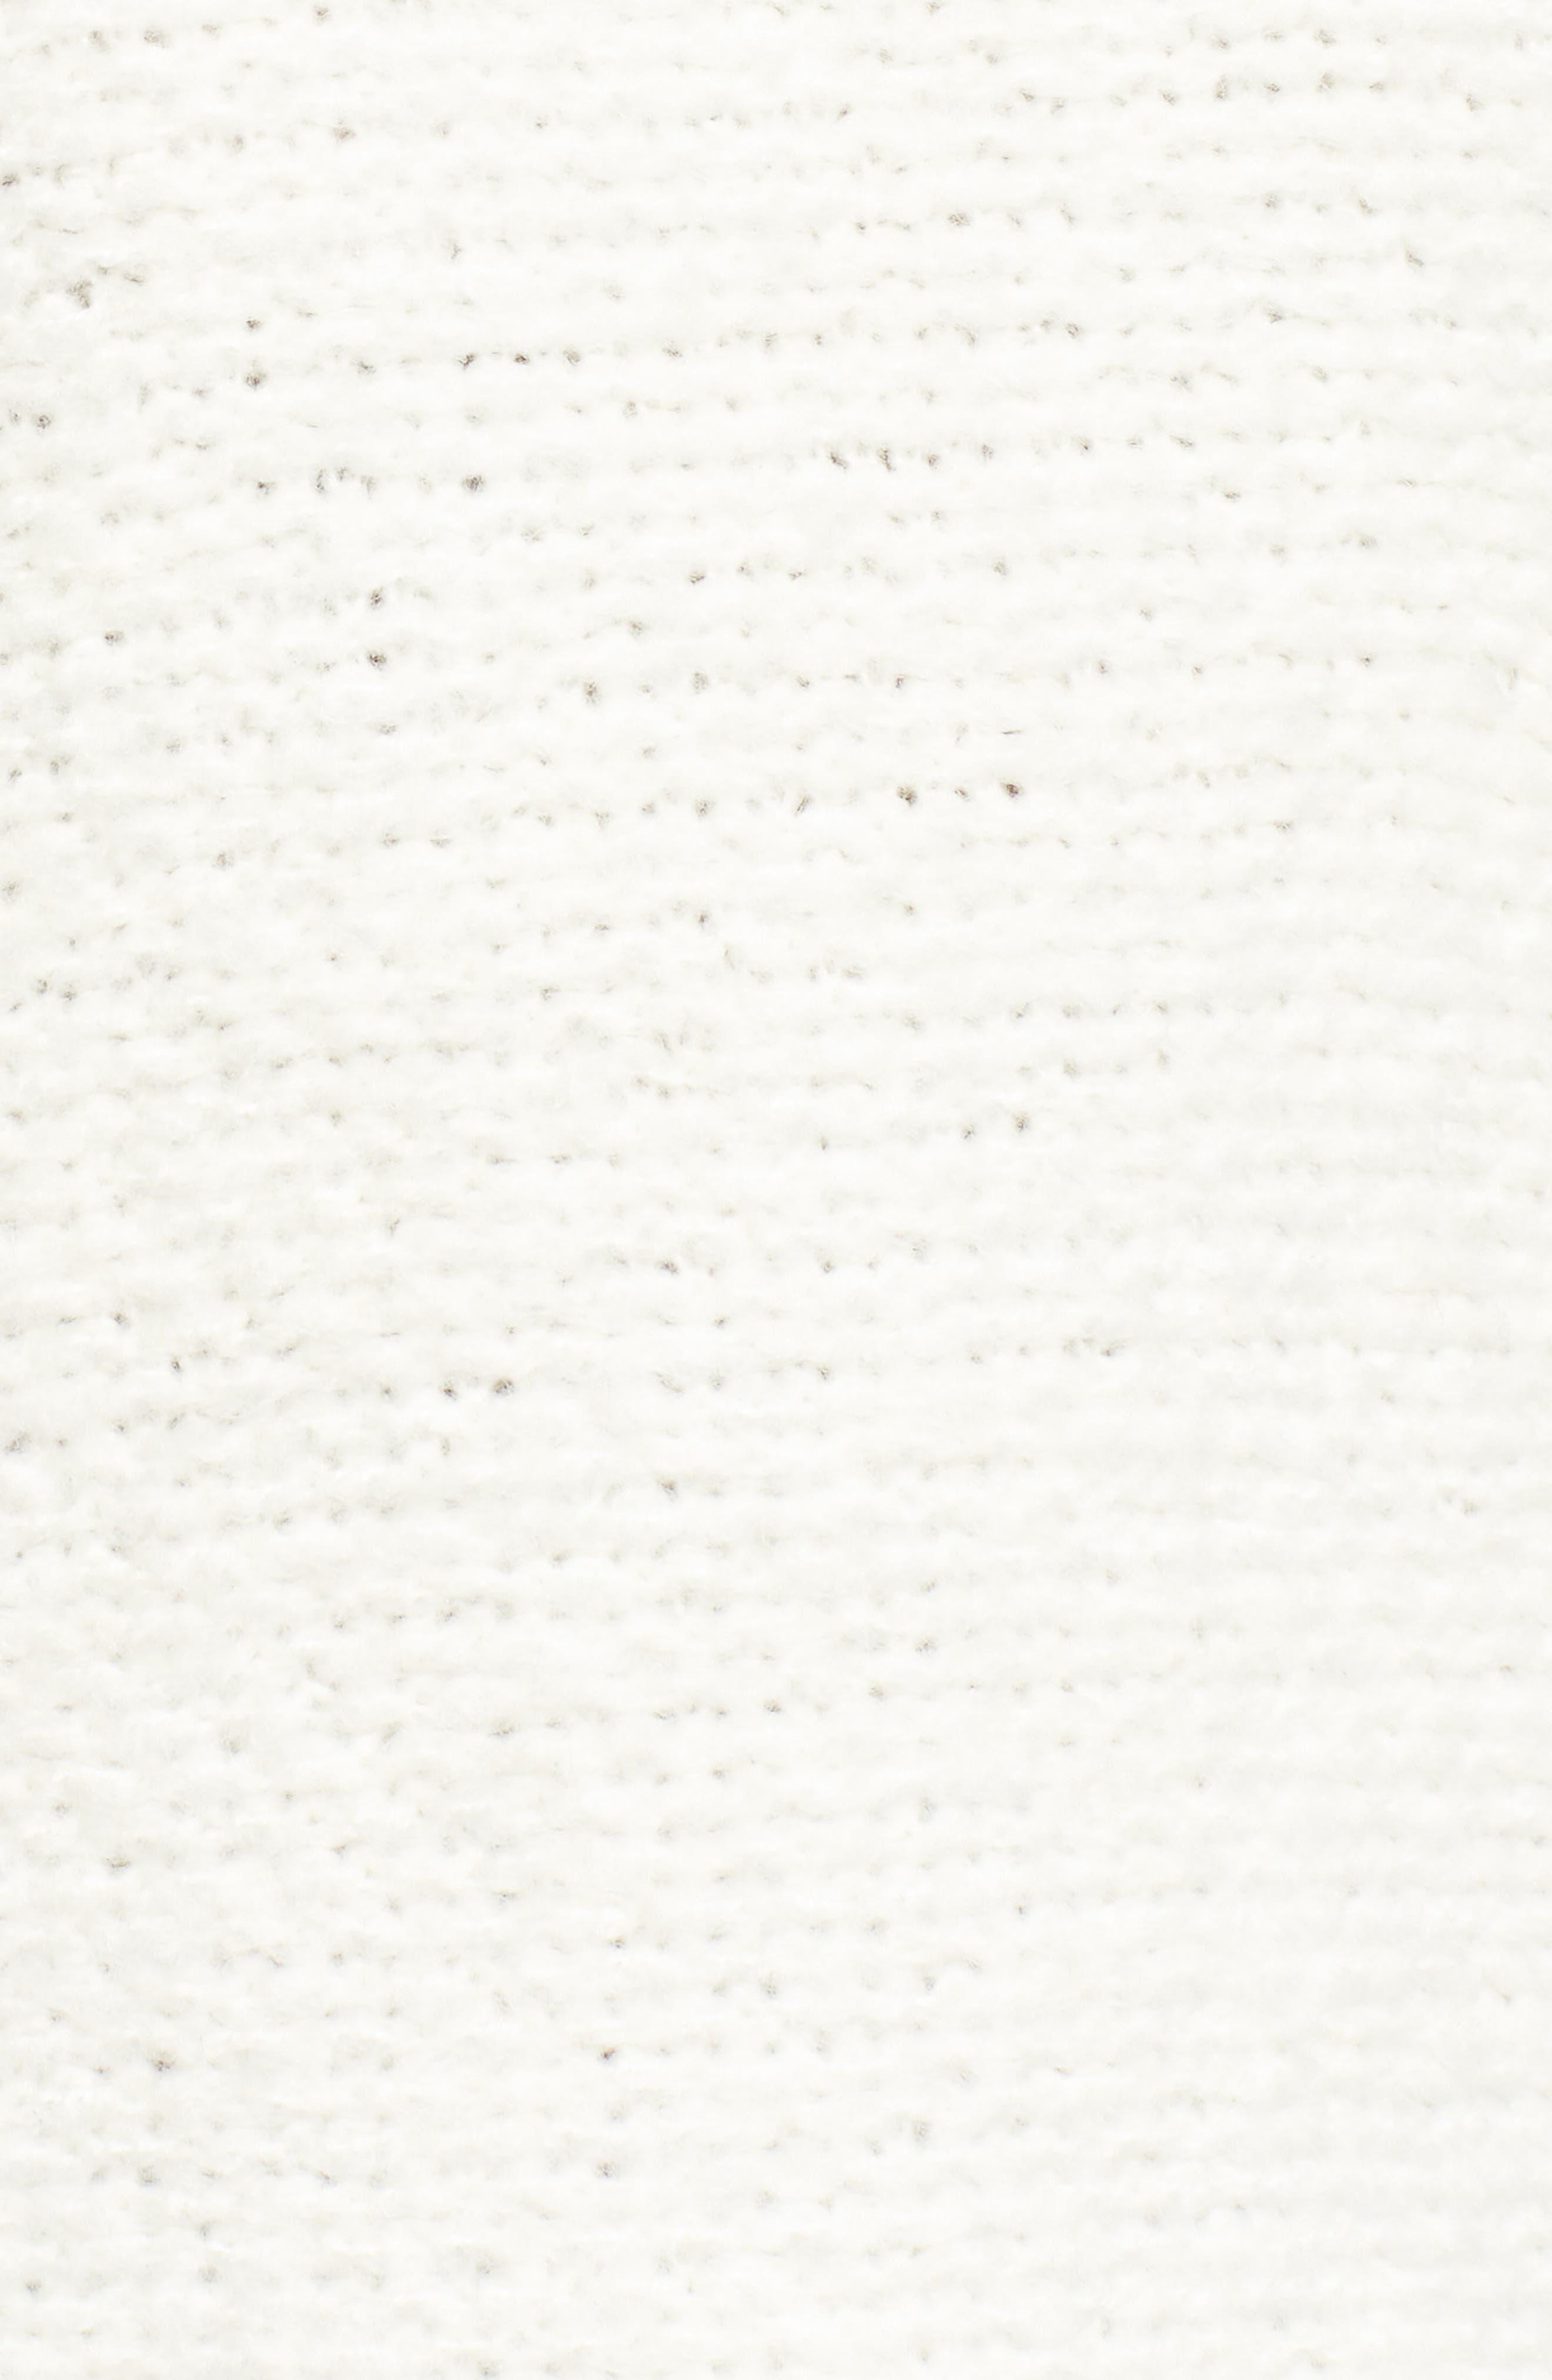 Kinks Turtleneck Sweater,                             Alternate thumbnail 10, color,